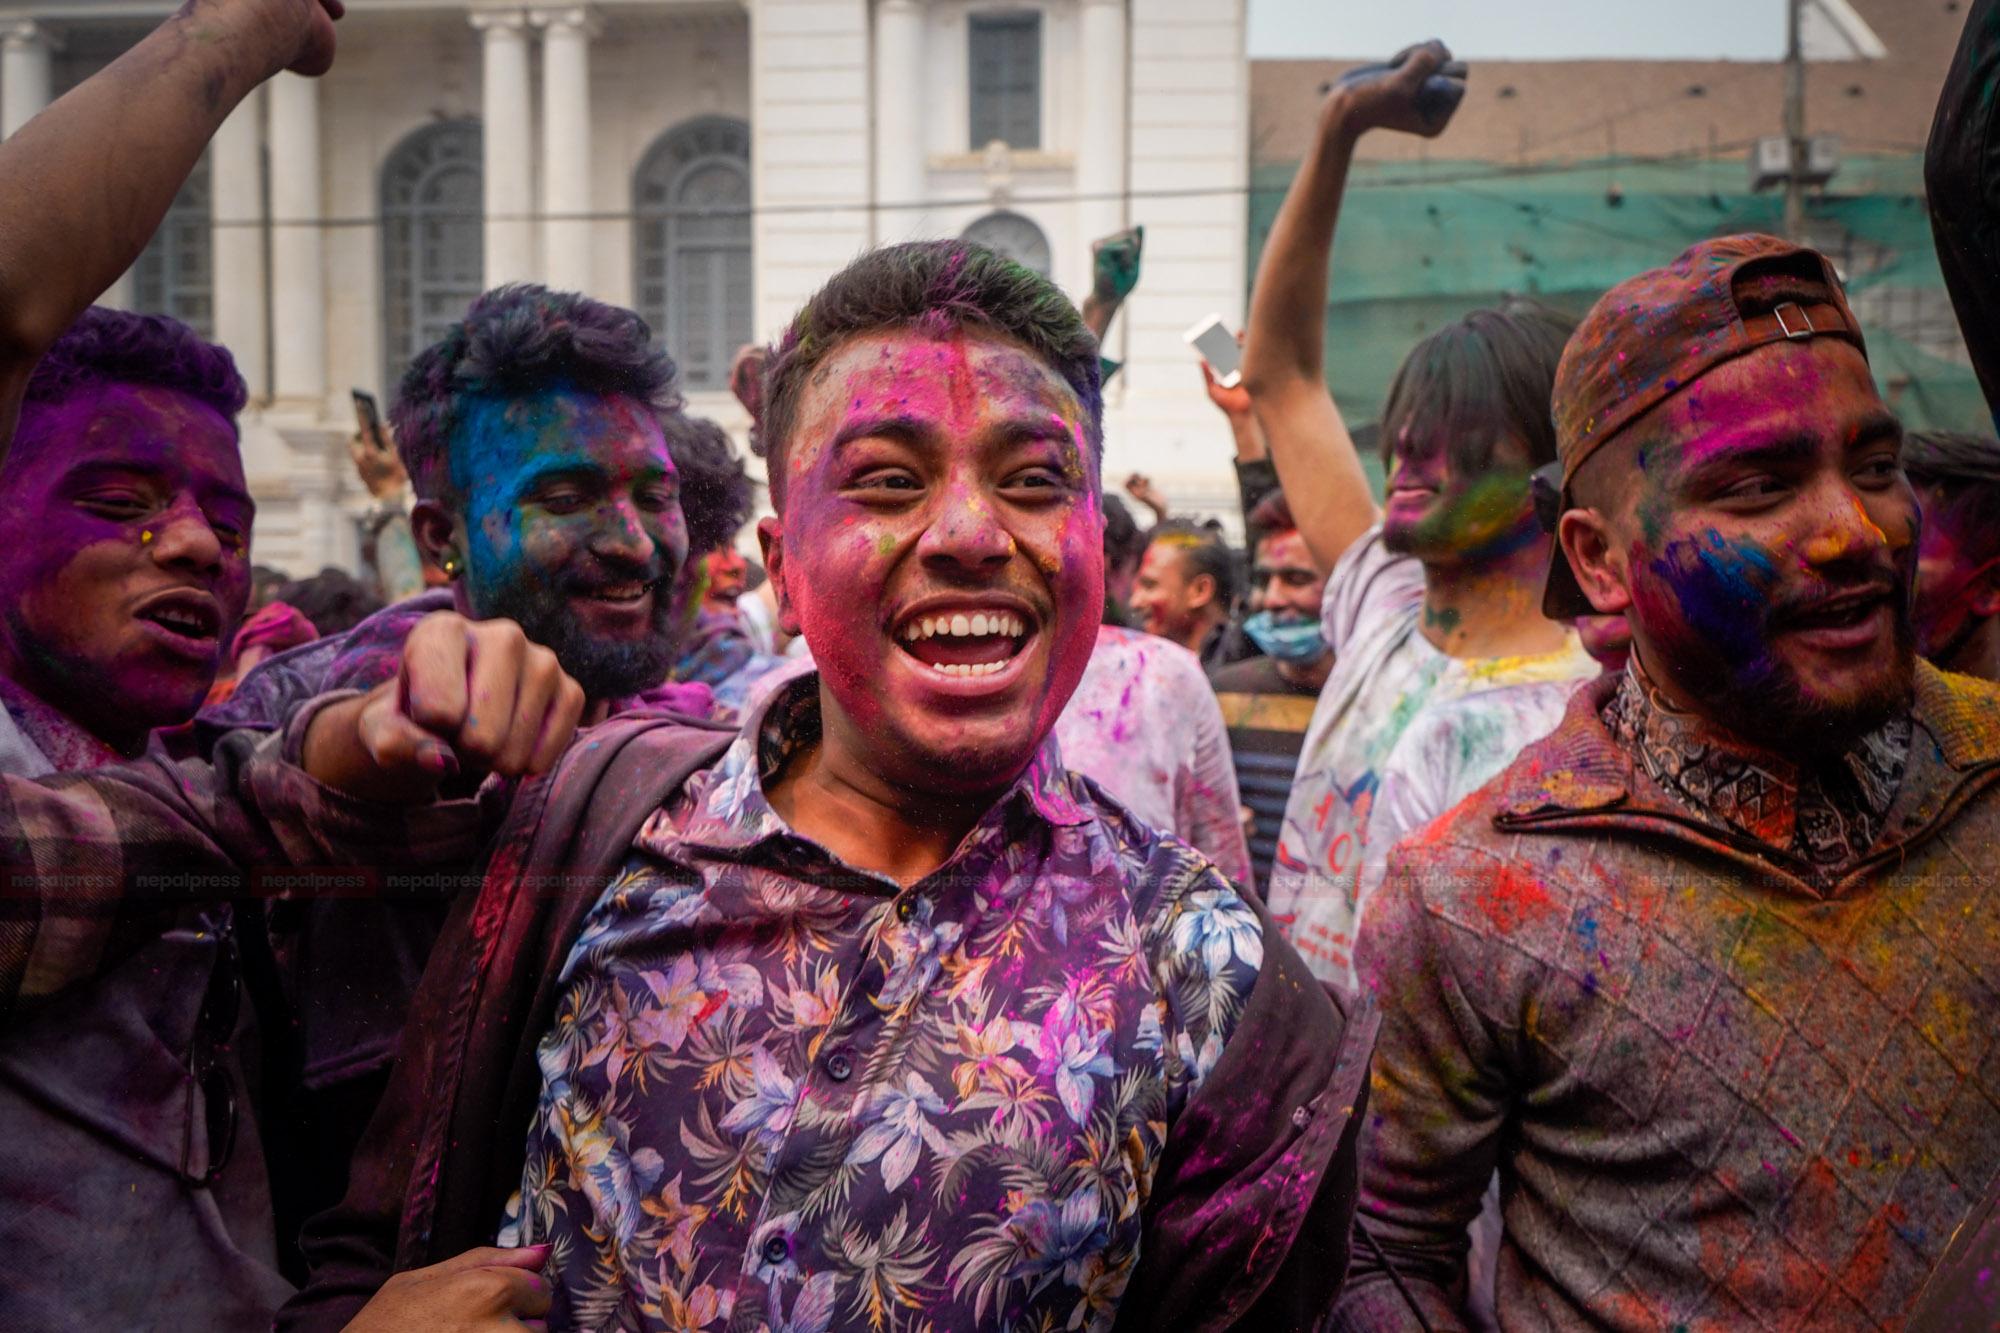 Celebration of Holi amidst COVID